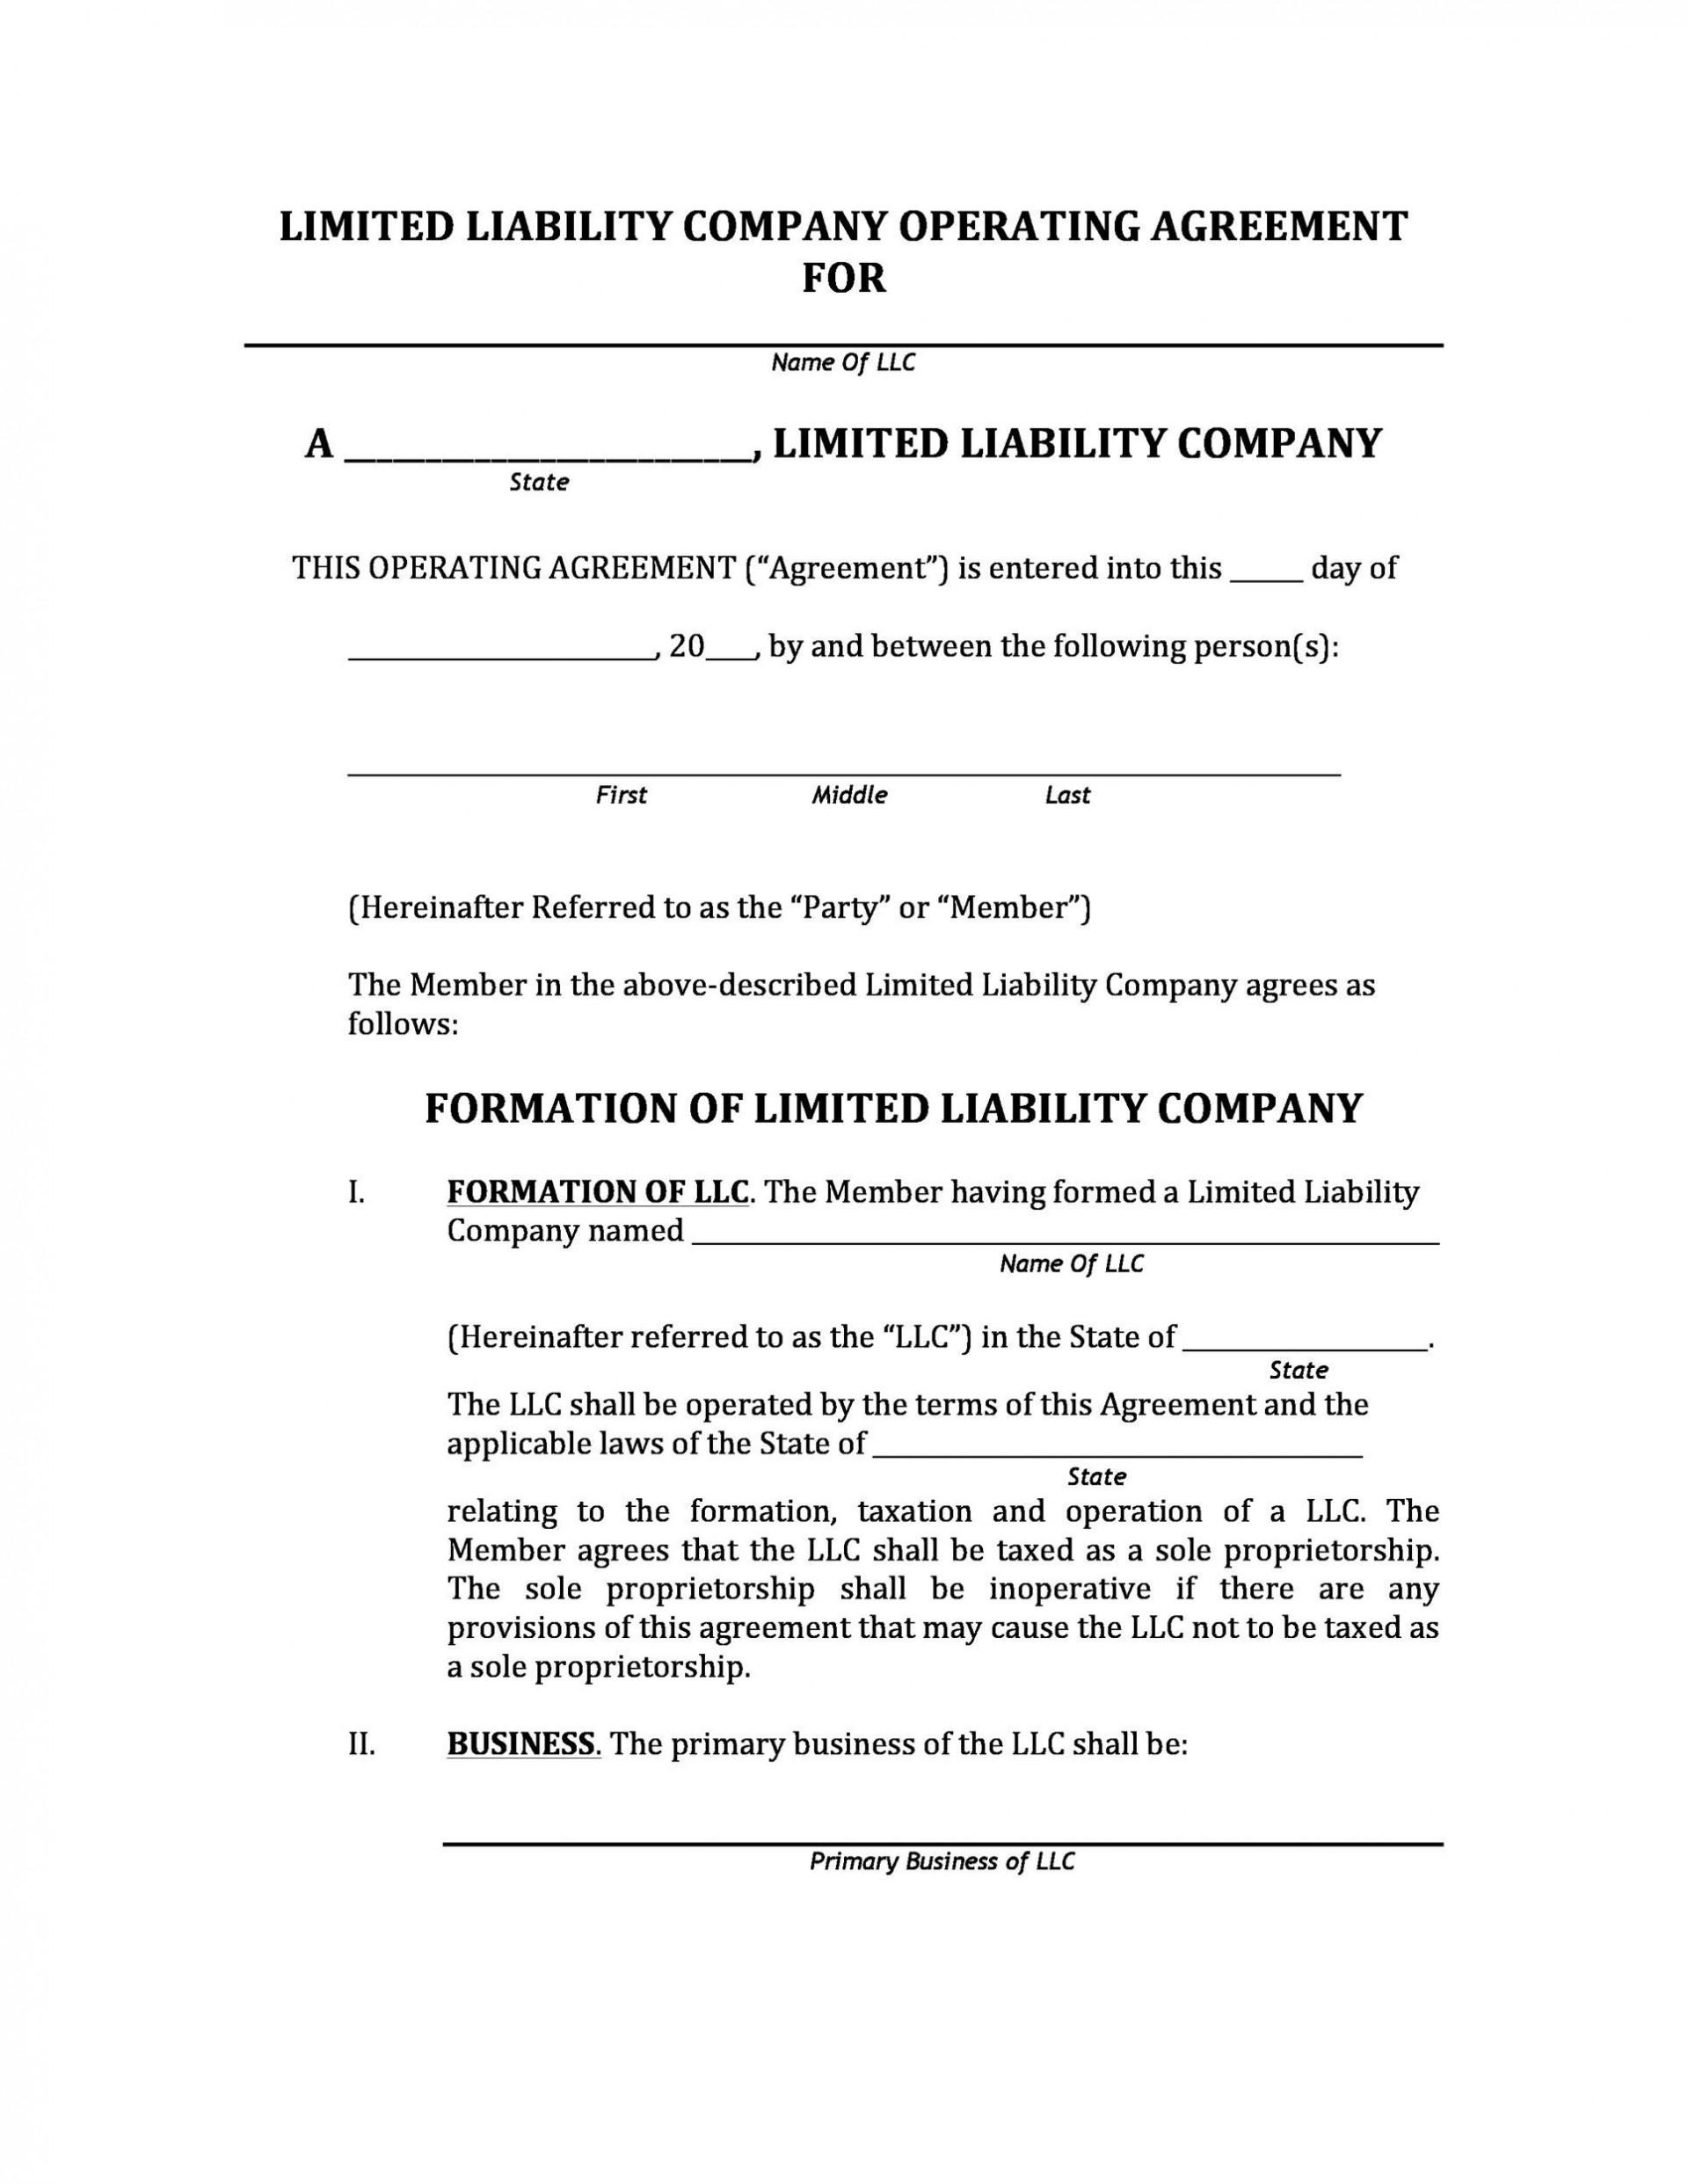 006 Marvelou Llc Partnership Agreement Template Image  Free Operating1920